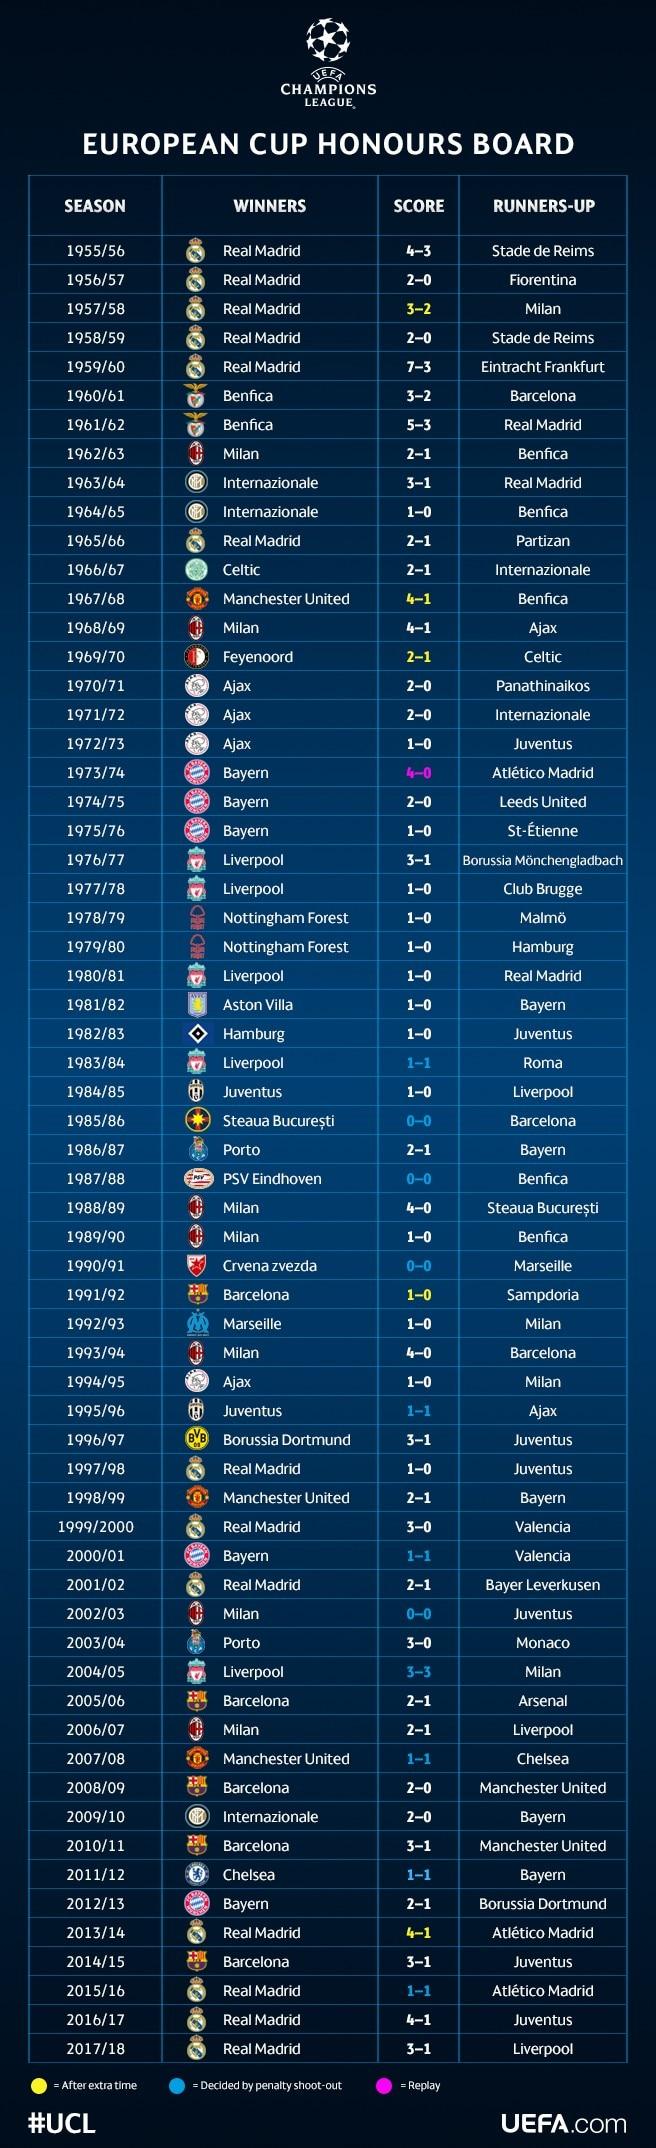 UEFA Champions League honours board